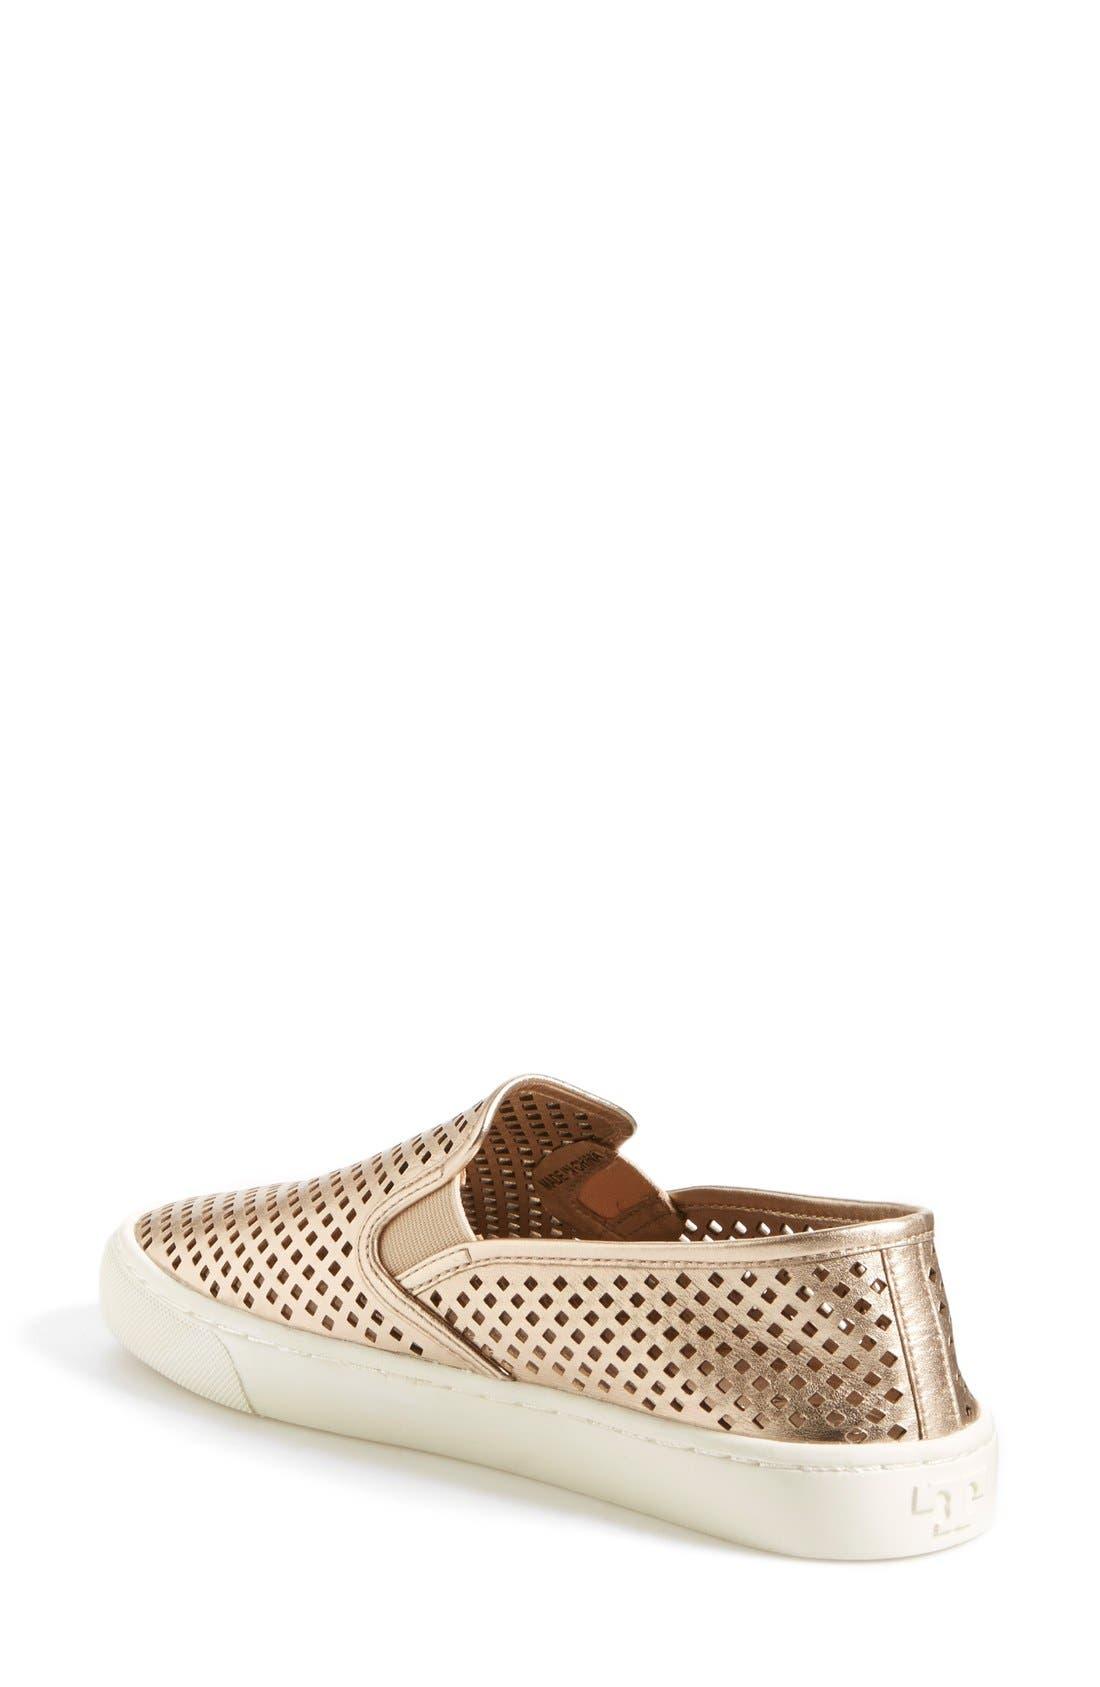 Alternate Image 2  - Tory Burch 'Jesse' Perforated Sneaker (Women)